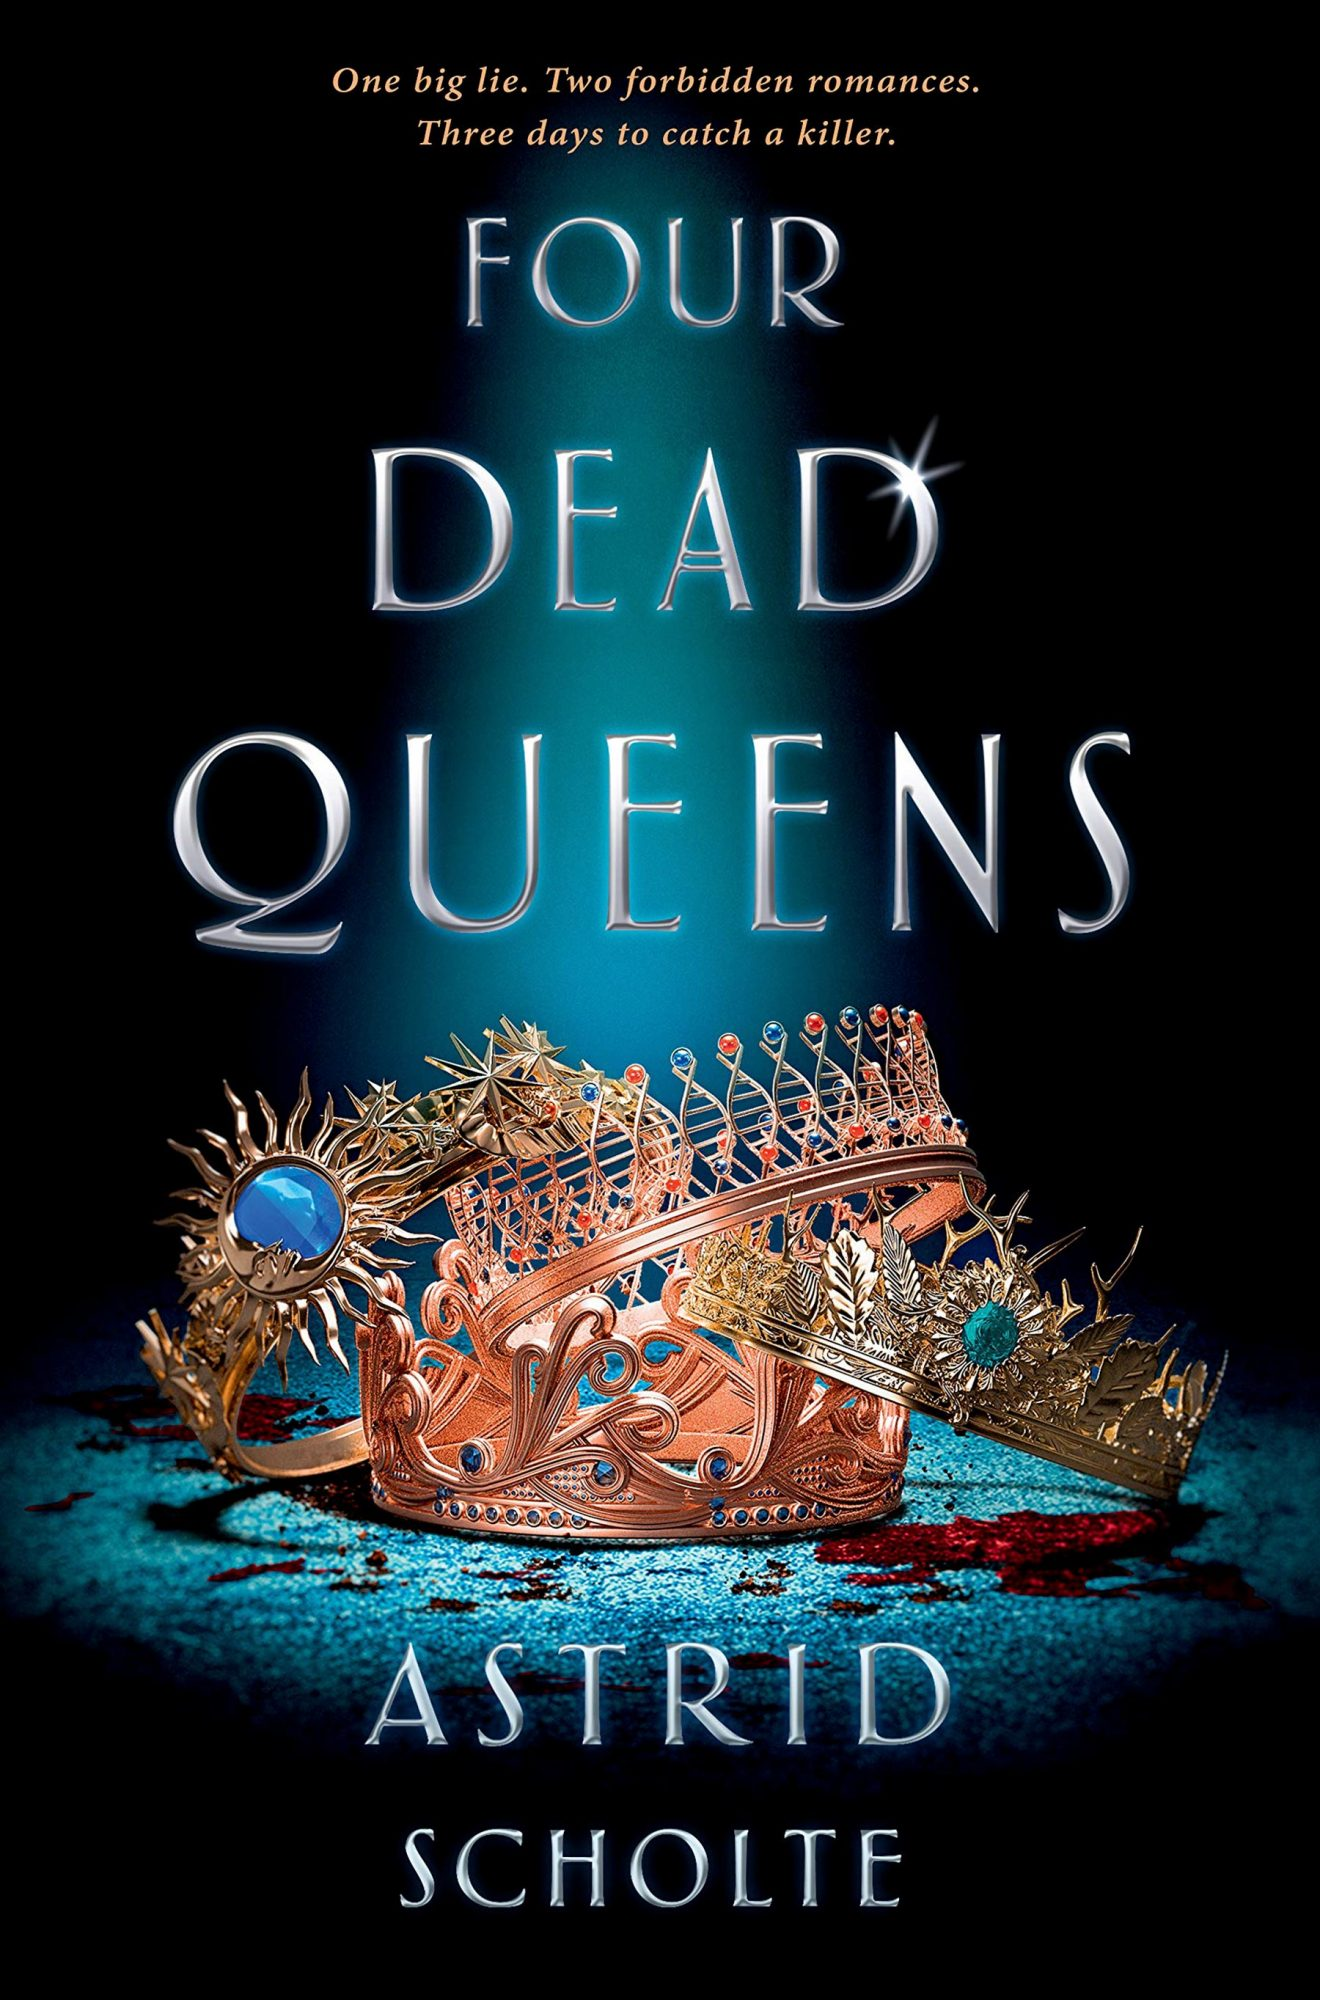 Four Dead Queens by Astrid ScholteCR: Penguin